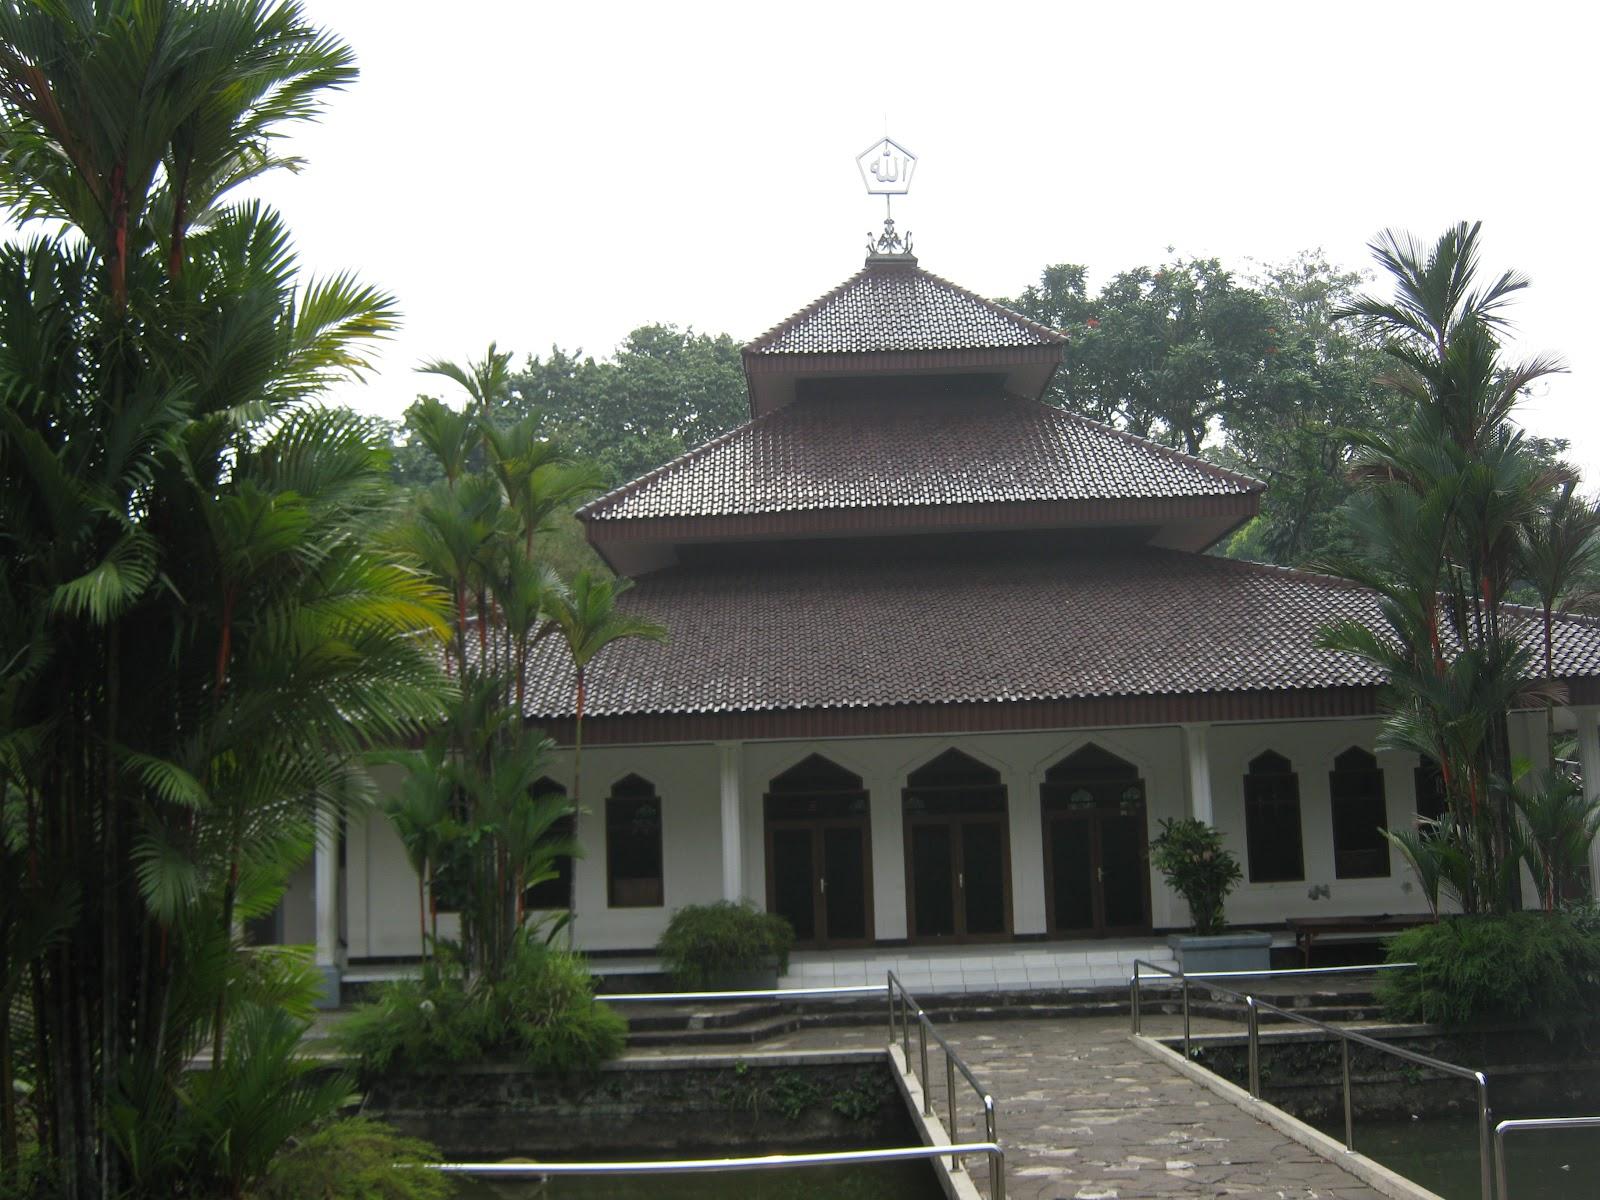 Masjid Amal Bhakti, Aek Nauli, Pollung